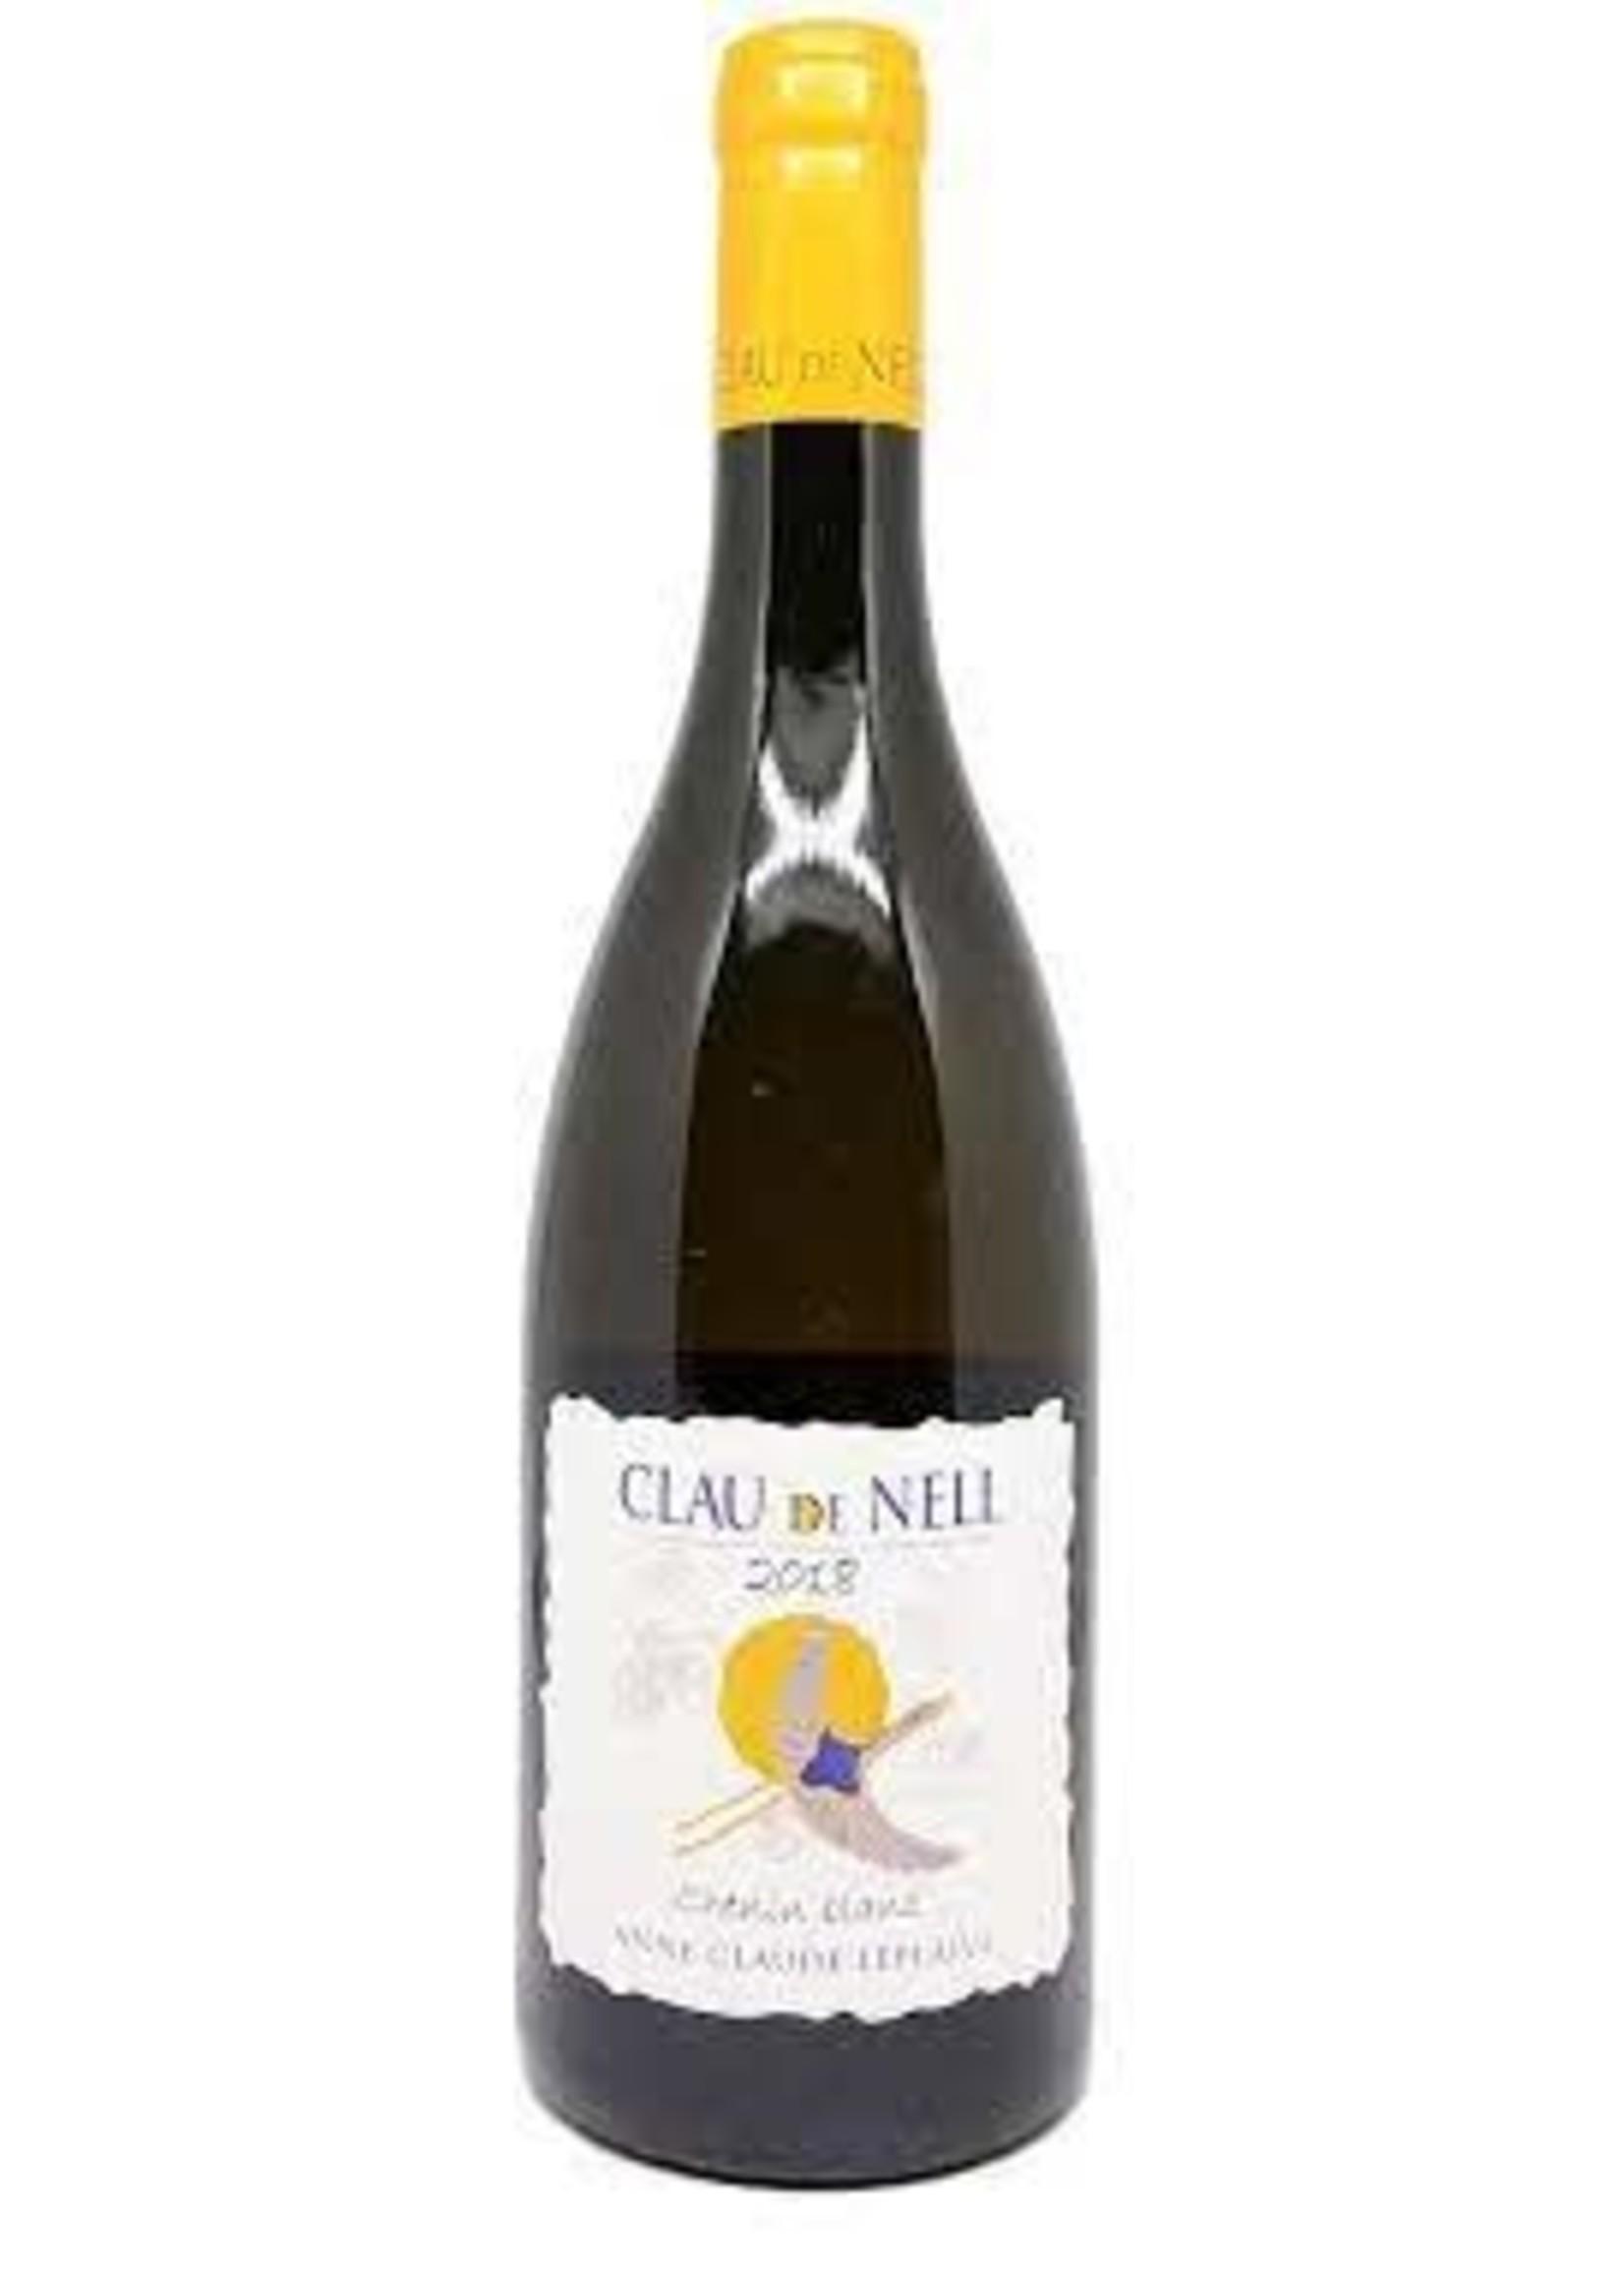 Clau de Nell 2018 Chenin Blanc 750ml